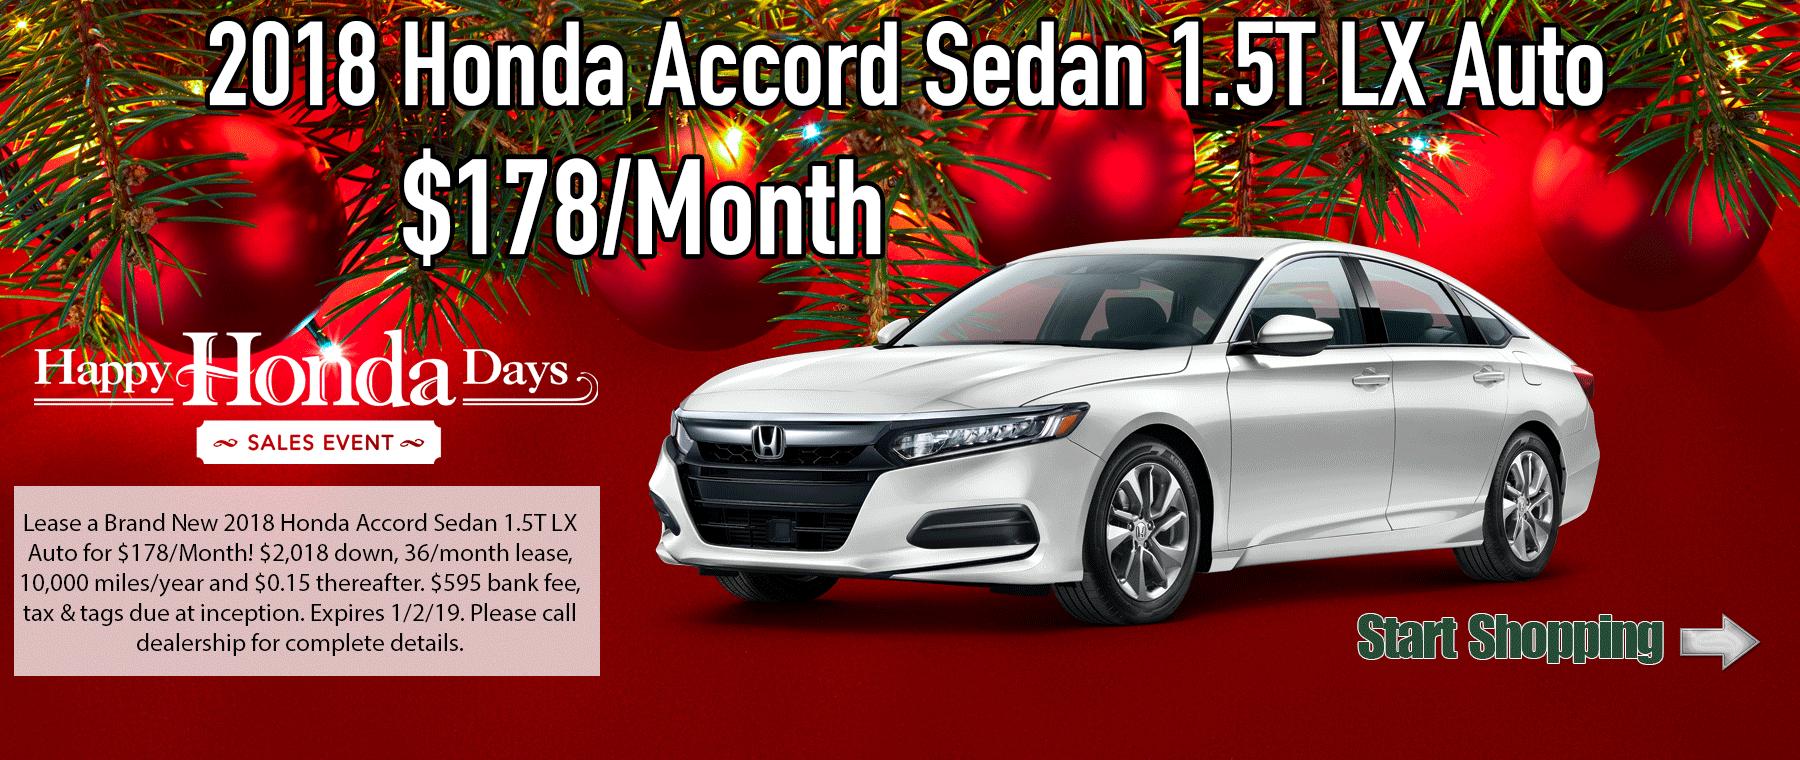 Honda Accord 1.5T LX Auto